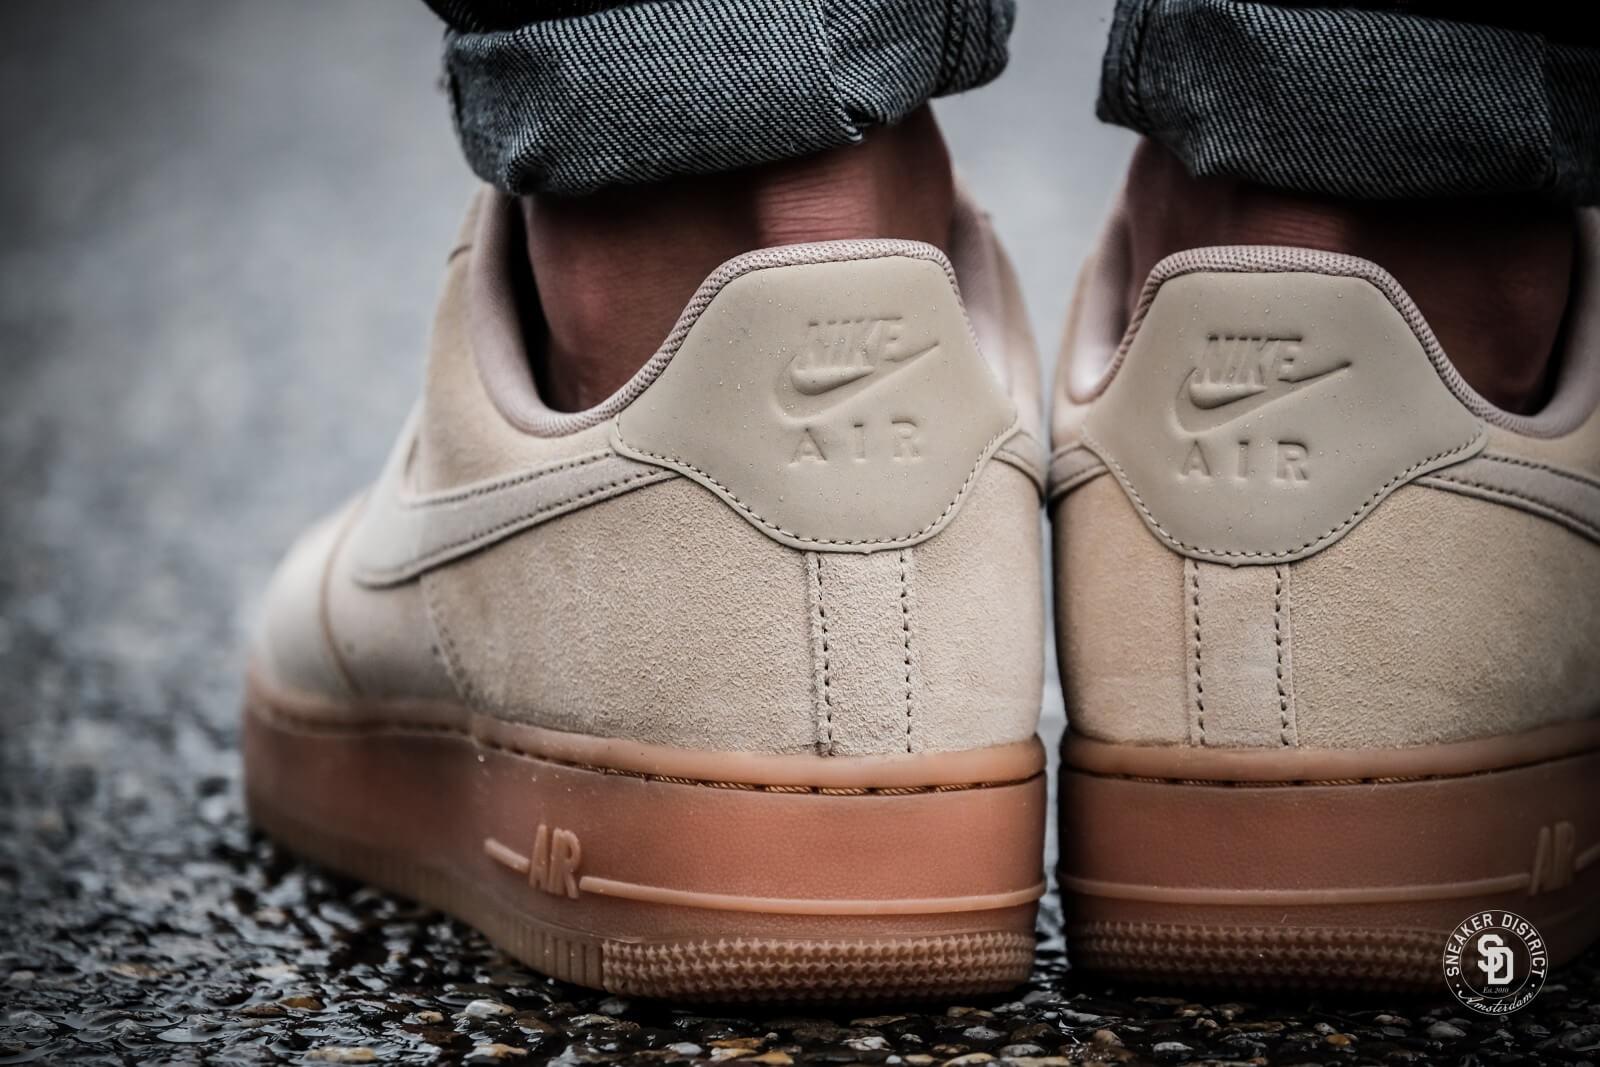 sports shoes 0c112 17468 Nike Air Force 1  07 LV8 Suede Mushroom-Gum Medium Brown-Ivory - AA1117-200